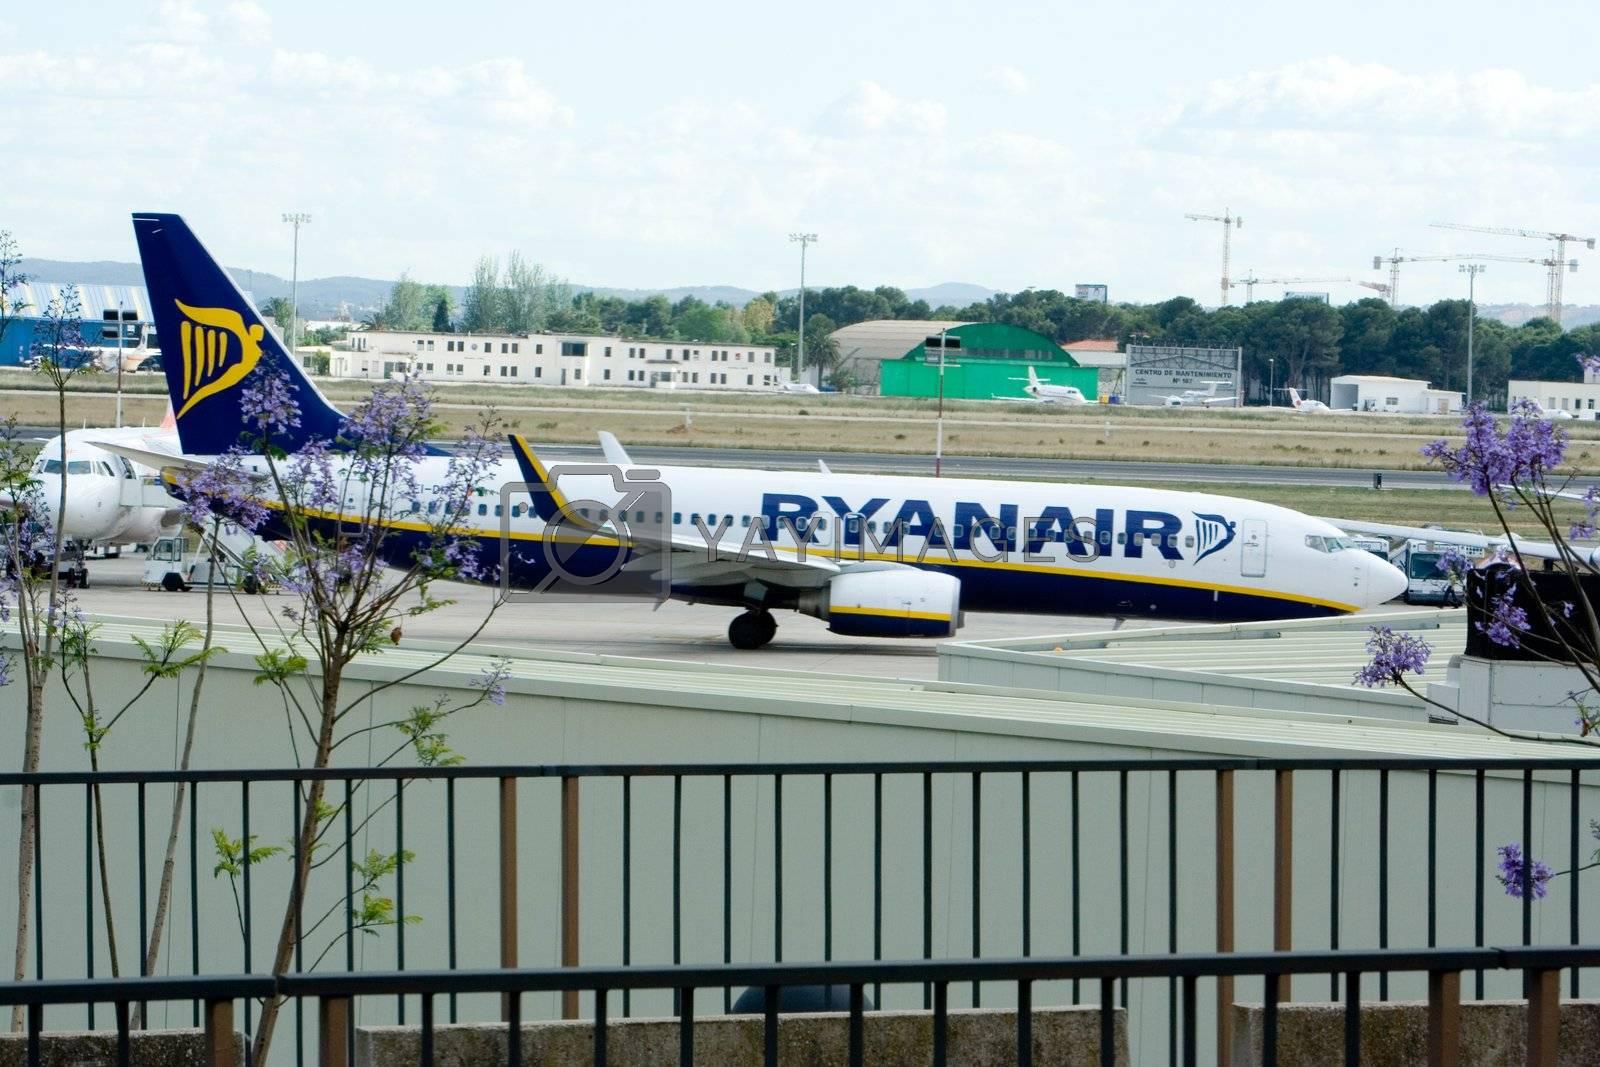 RyanAir at Valencia